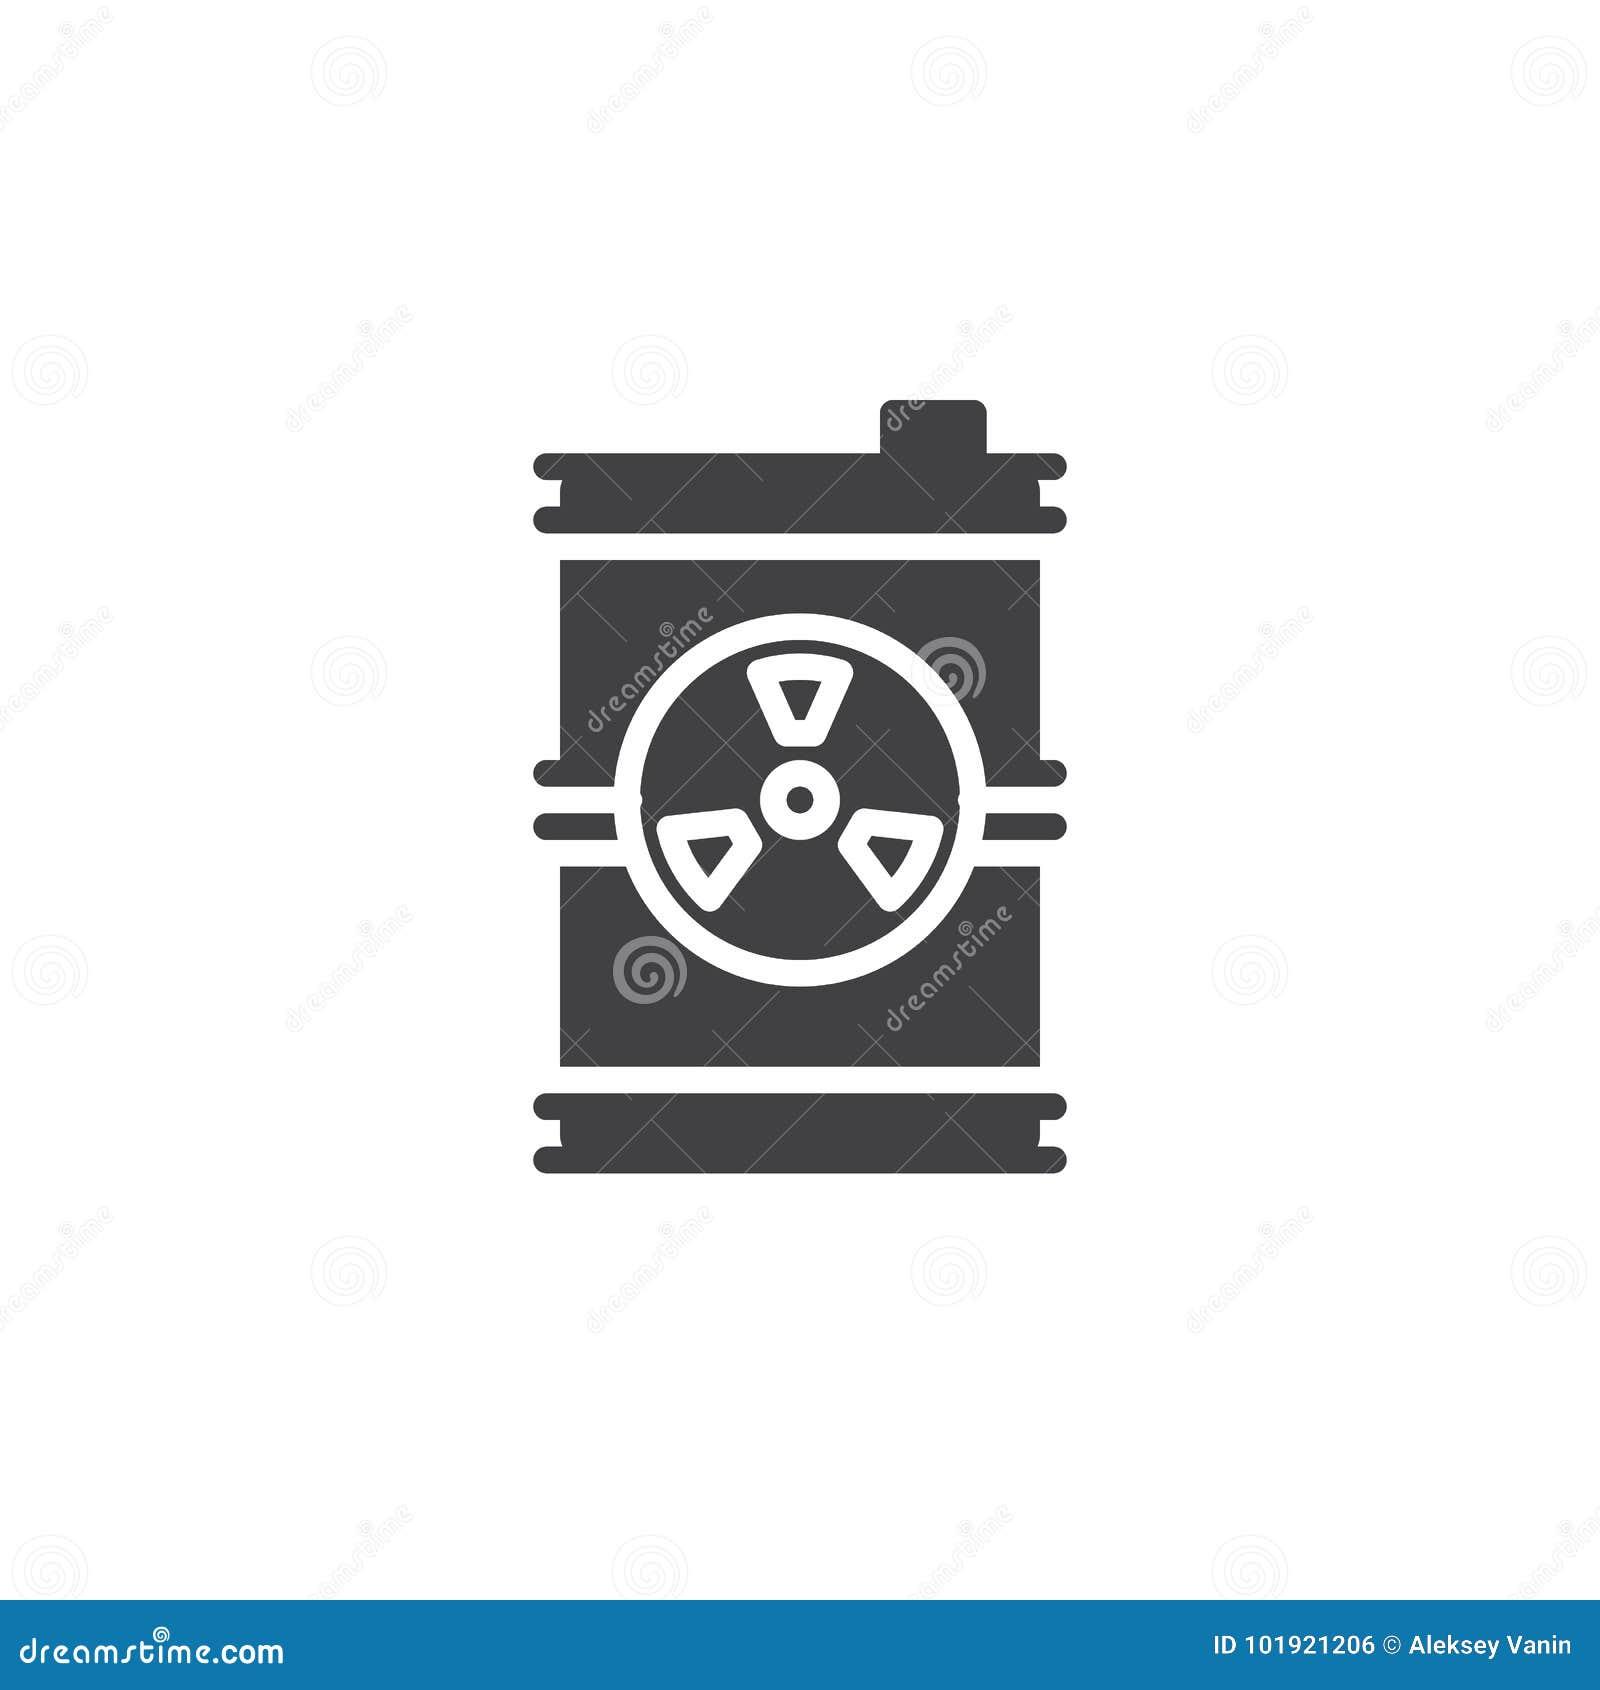 Toxic Barrel Icon Vector Stock Vector Illustration Of Flat 101921206